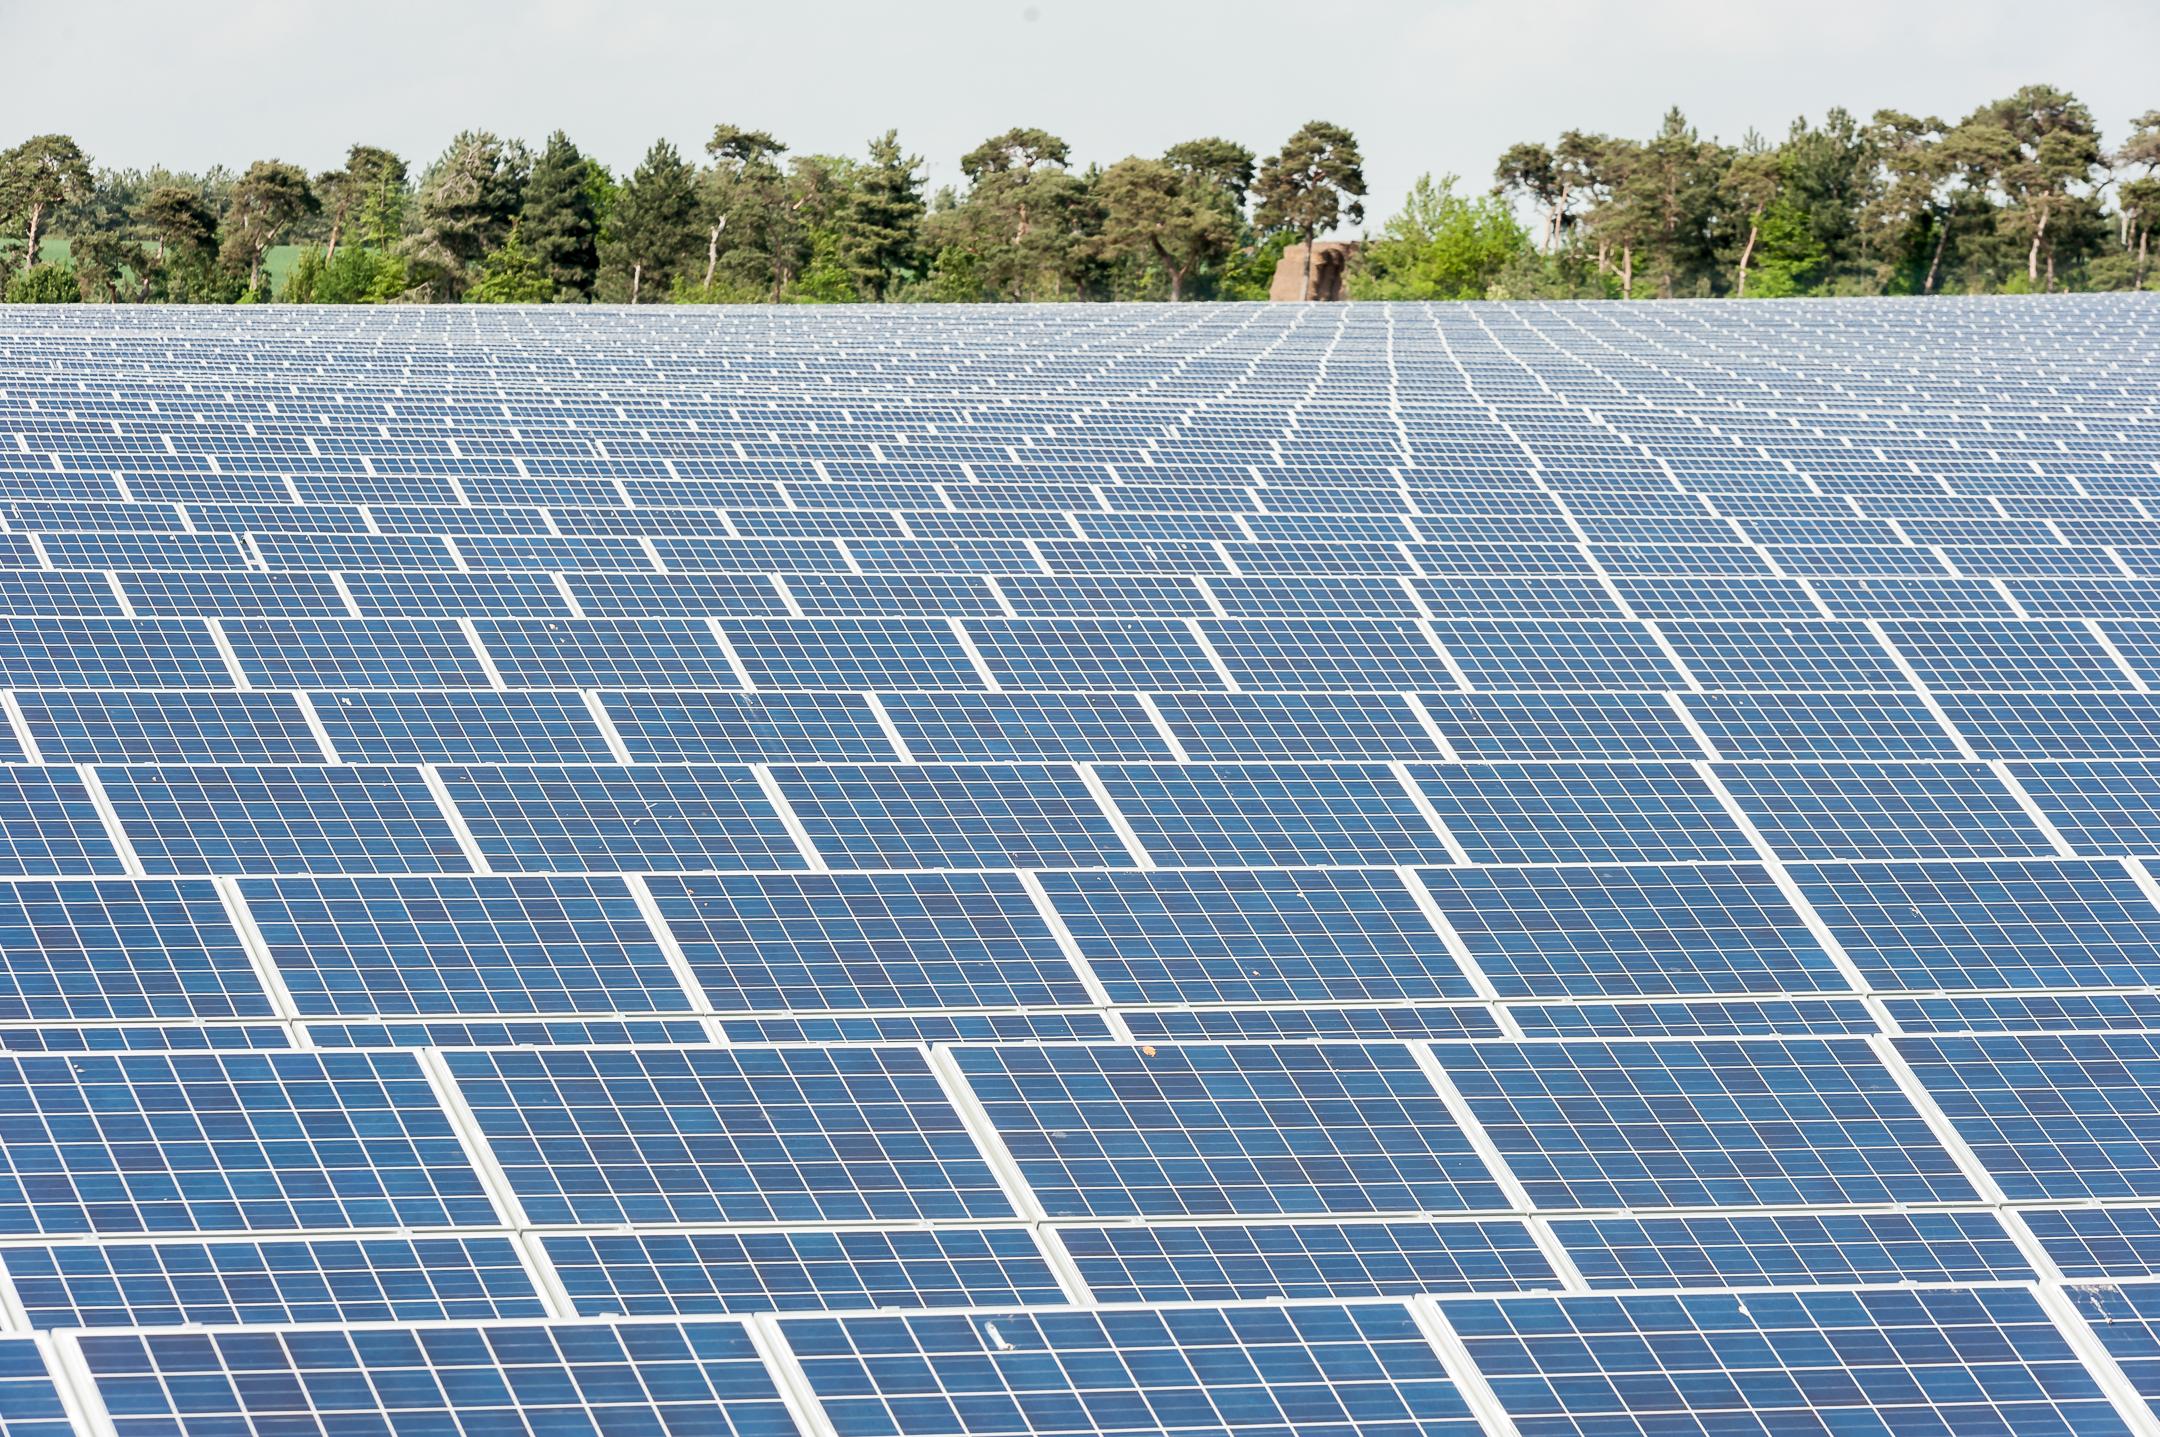 Bay Solar Farm